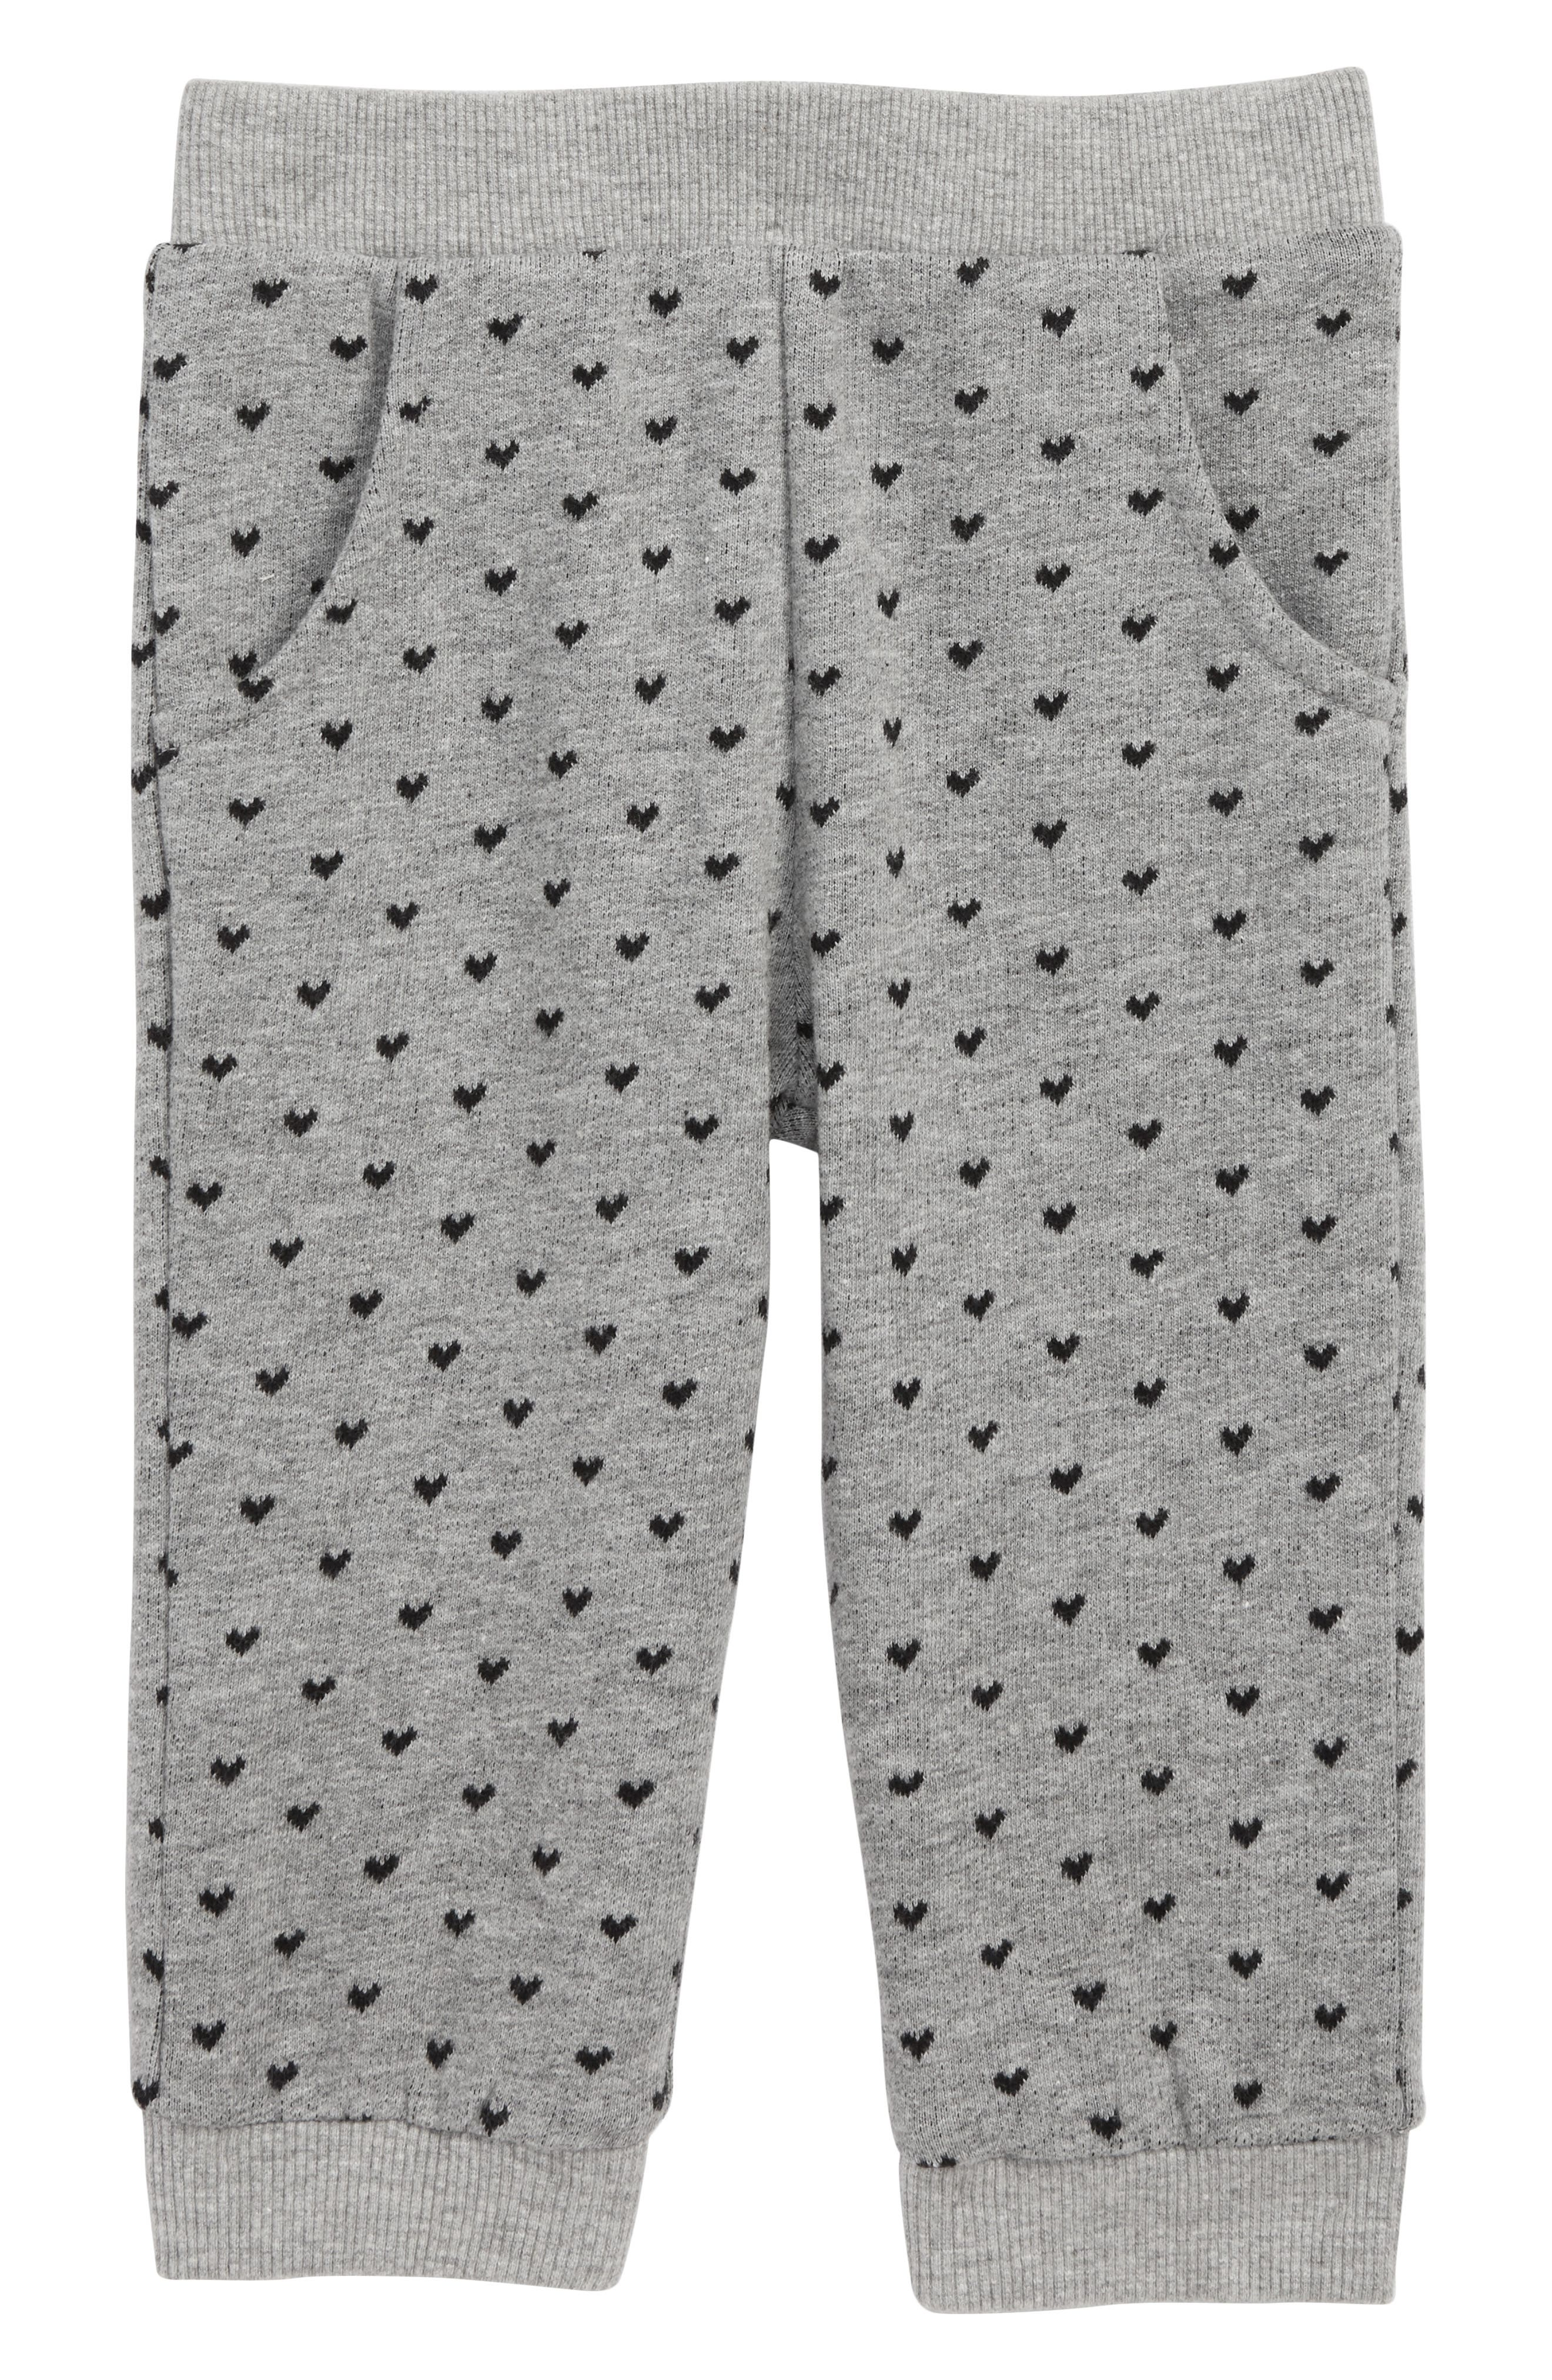 Peek Heart Traveler Knit Pants,                         Main,                         color, HEATHER GREY